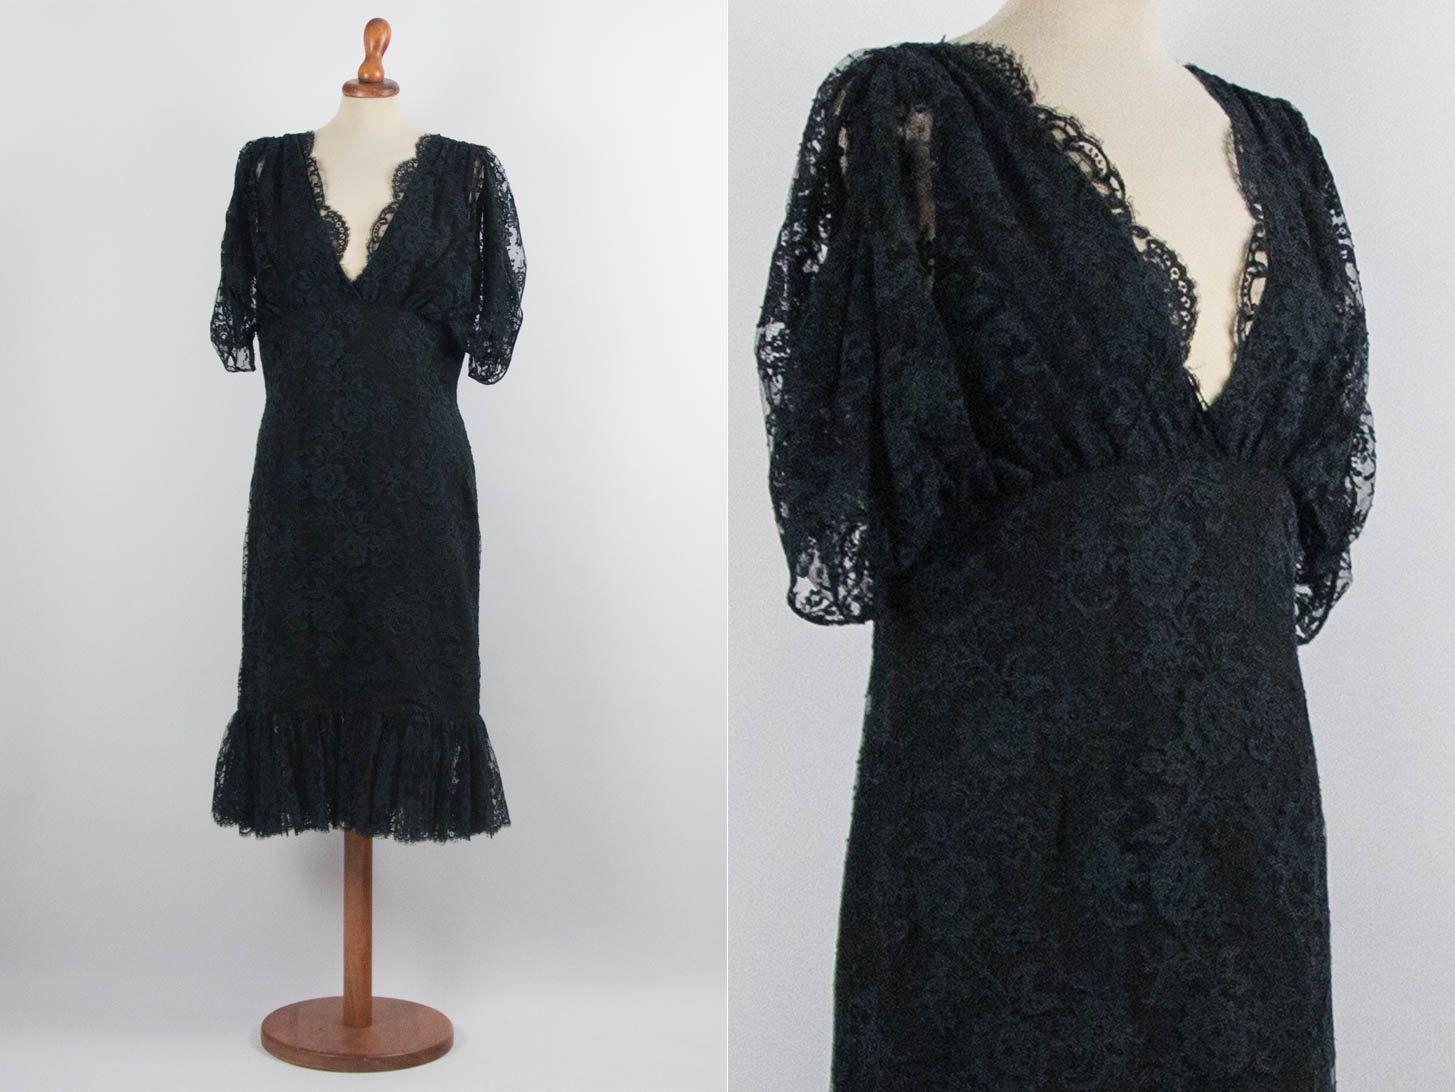 40s Lace Dress Romantic Vintage Black Color Gipsy Dress Etsy Lace Dress Dresses Tailored Dress [ 1092 x 1455 Pixel ]